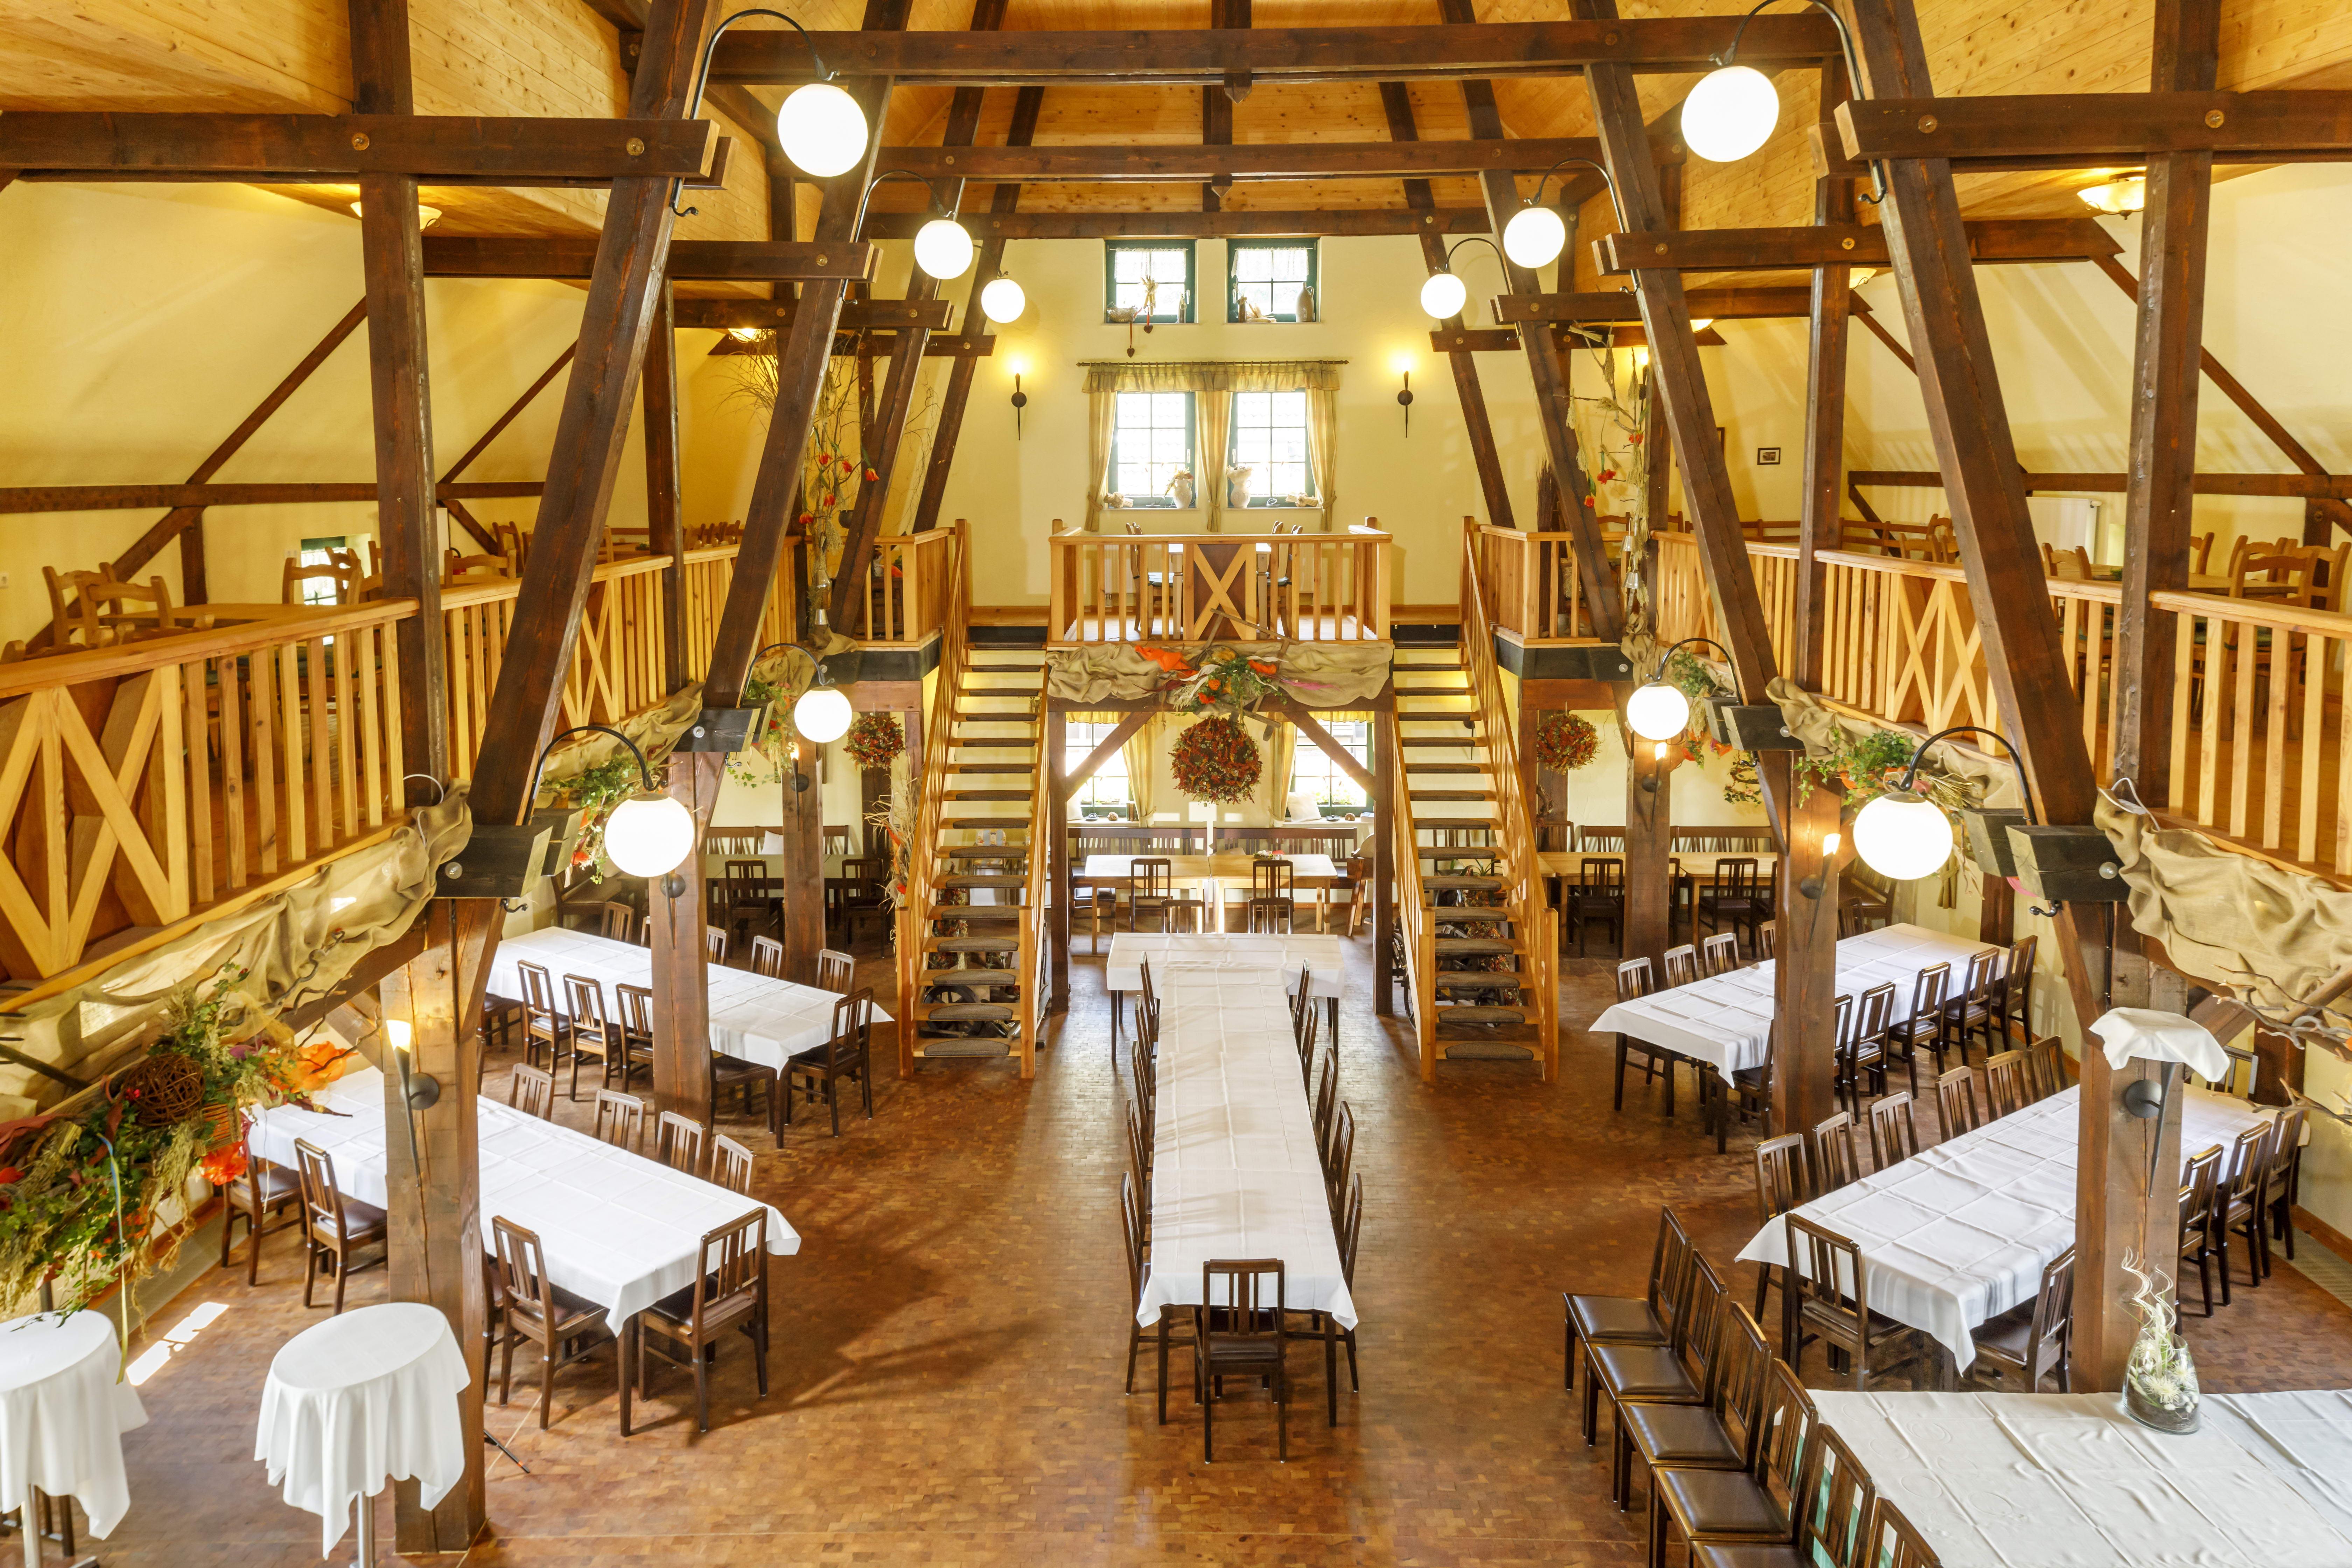 Festsaal Kräuterscheune